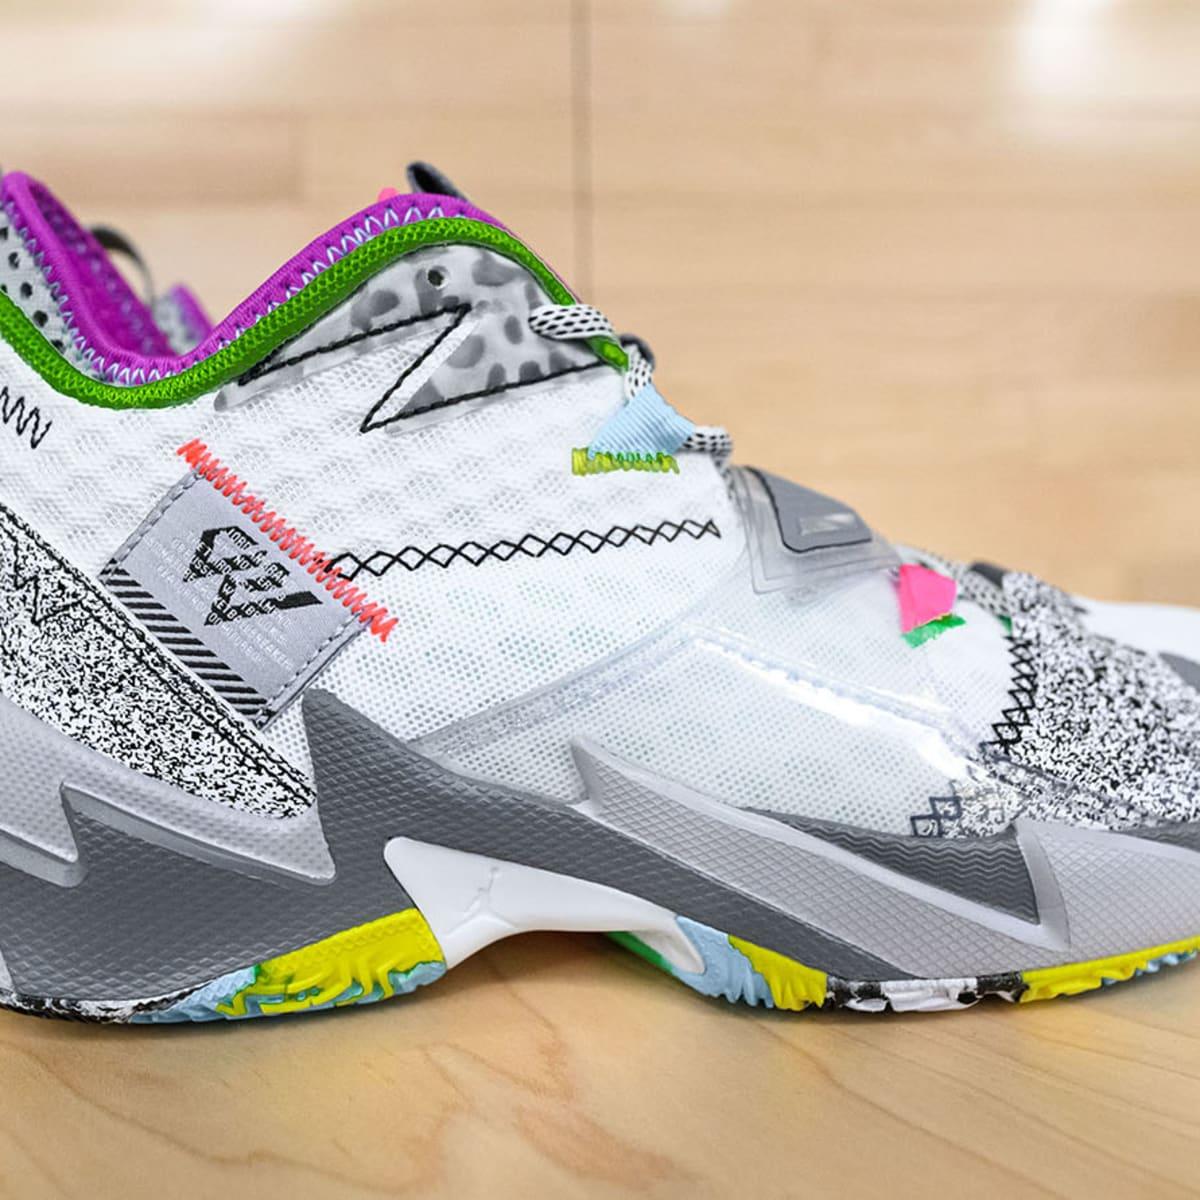 Russell Westbrook, Jordan Brand unveil